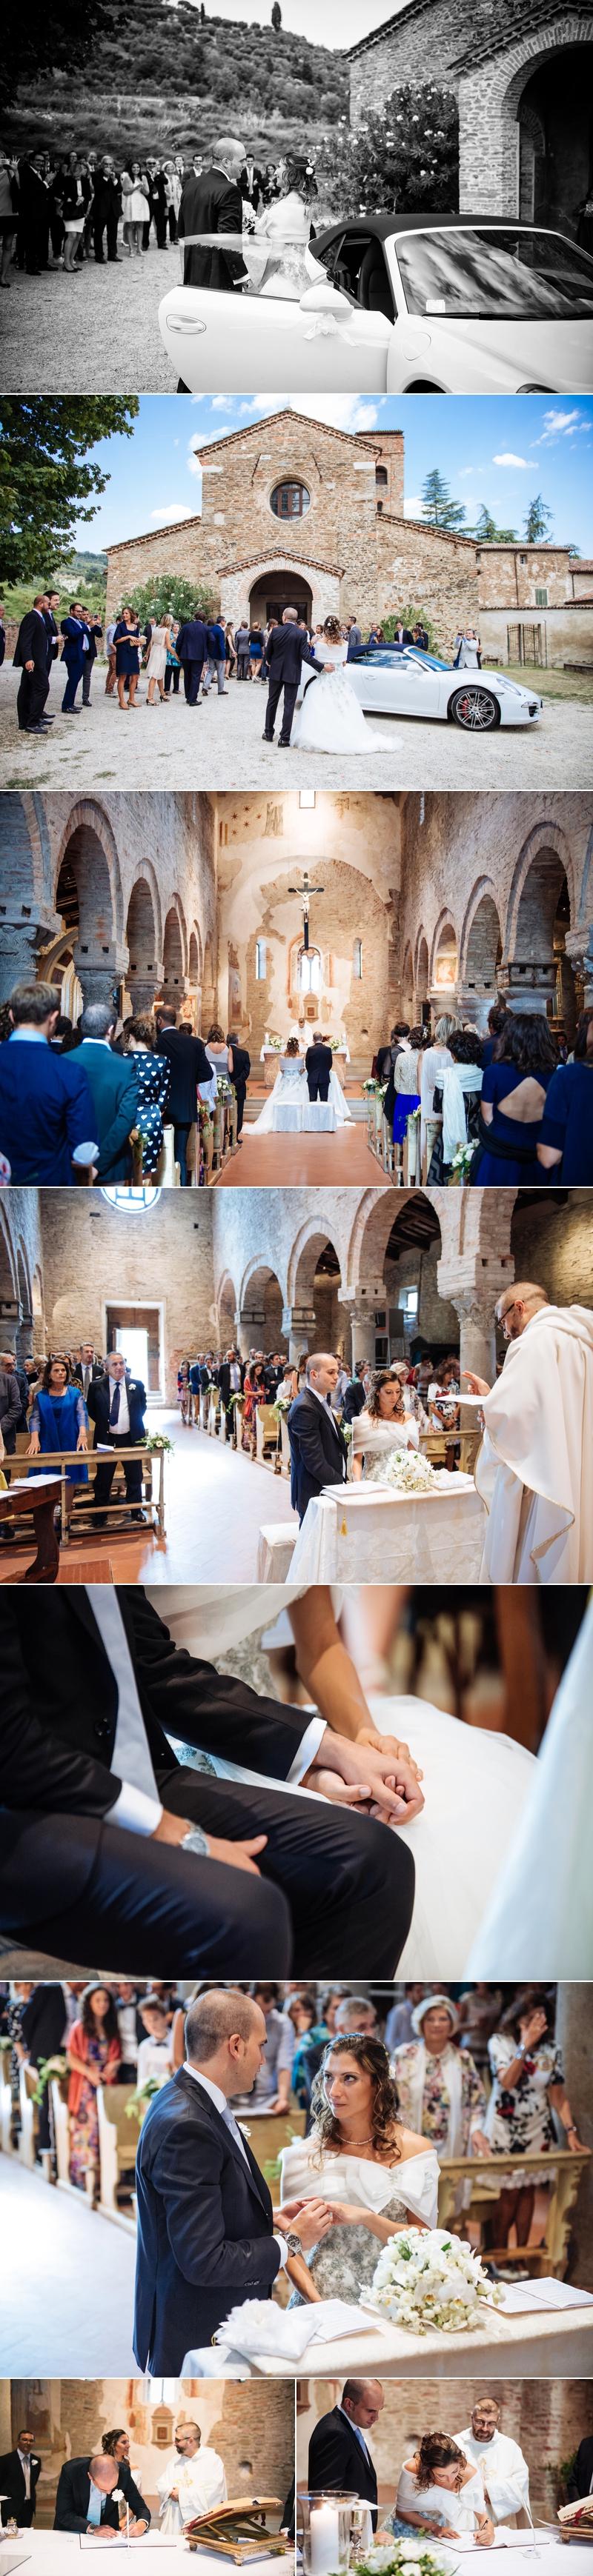 Fotografo Matrimonio Pieve del Tho Brisighella Monastero Scardavilla Meldola Valentina Cavallini 6